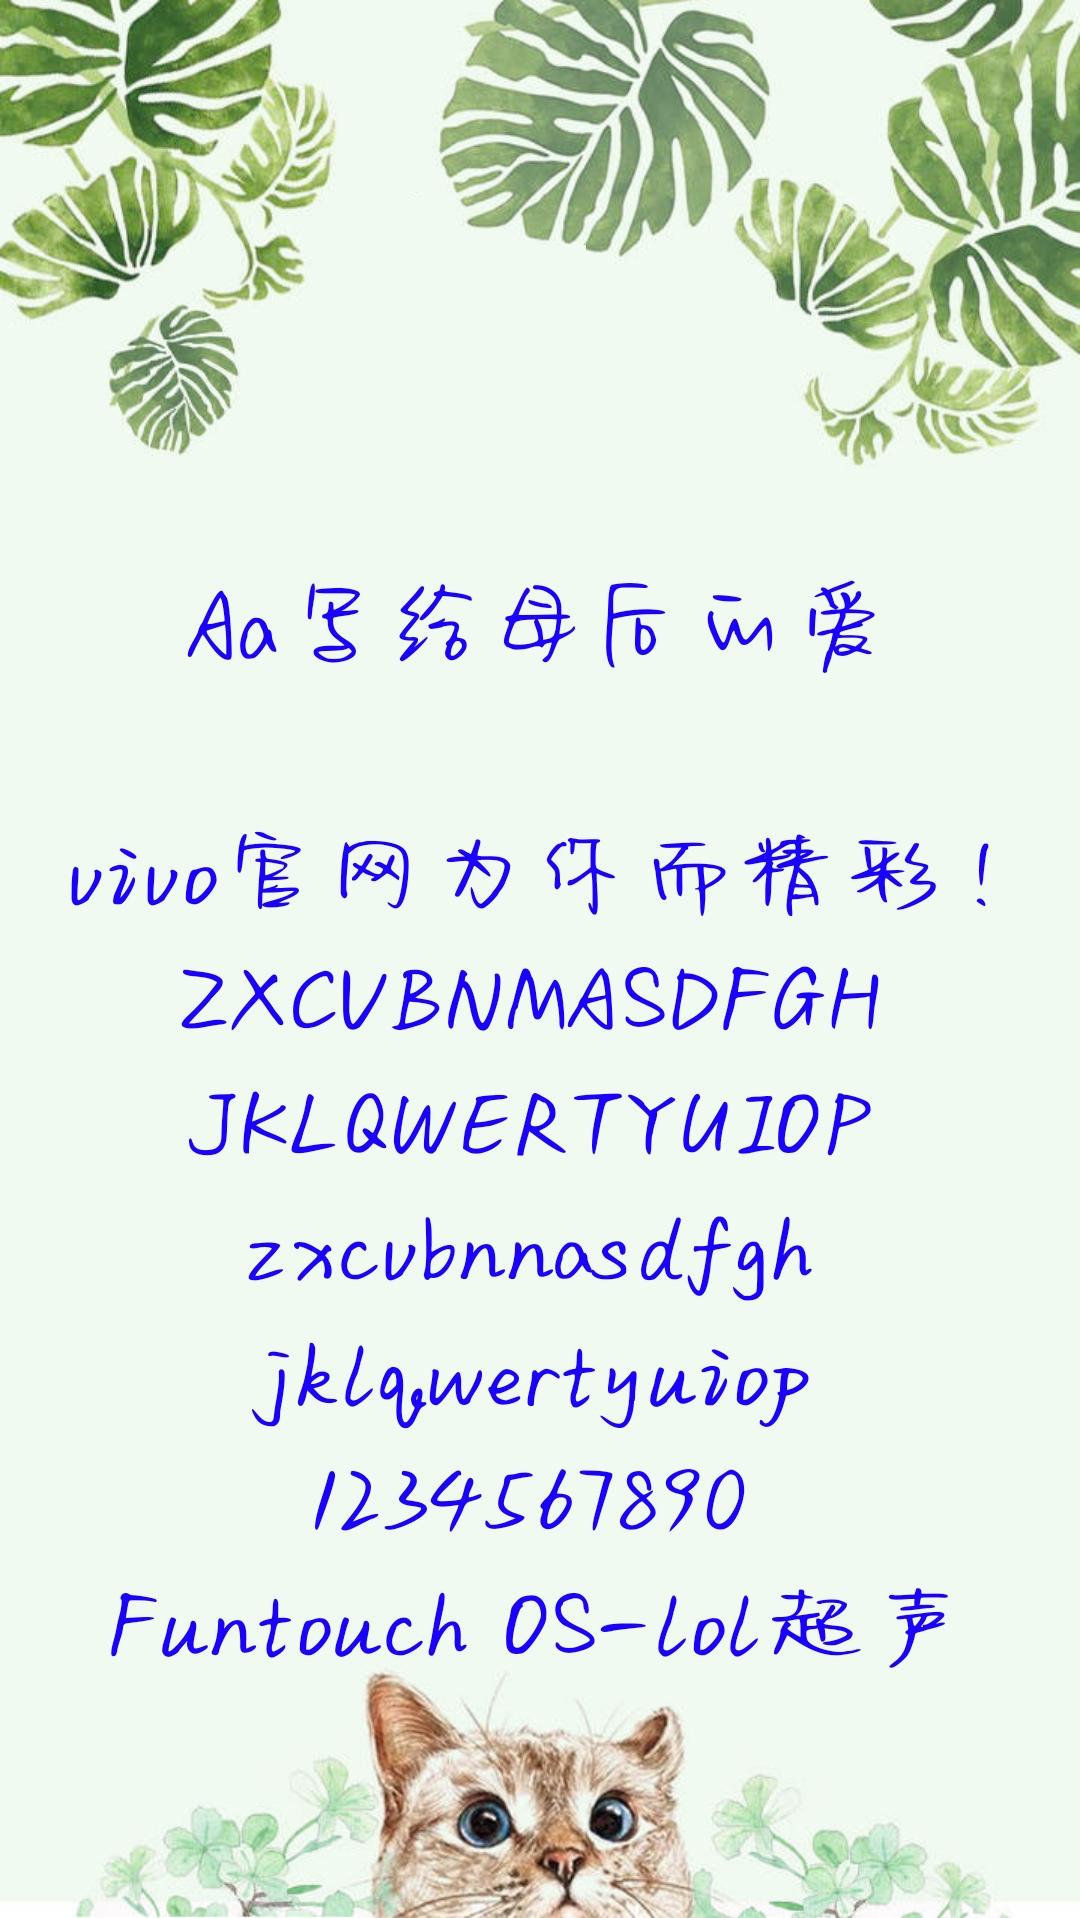 IMG_20180603_200752.jpg